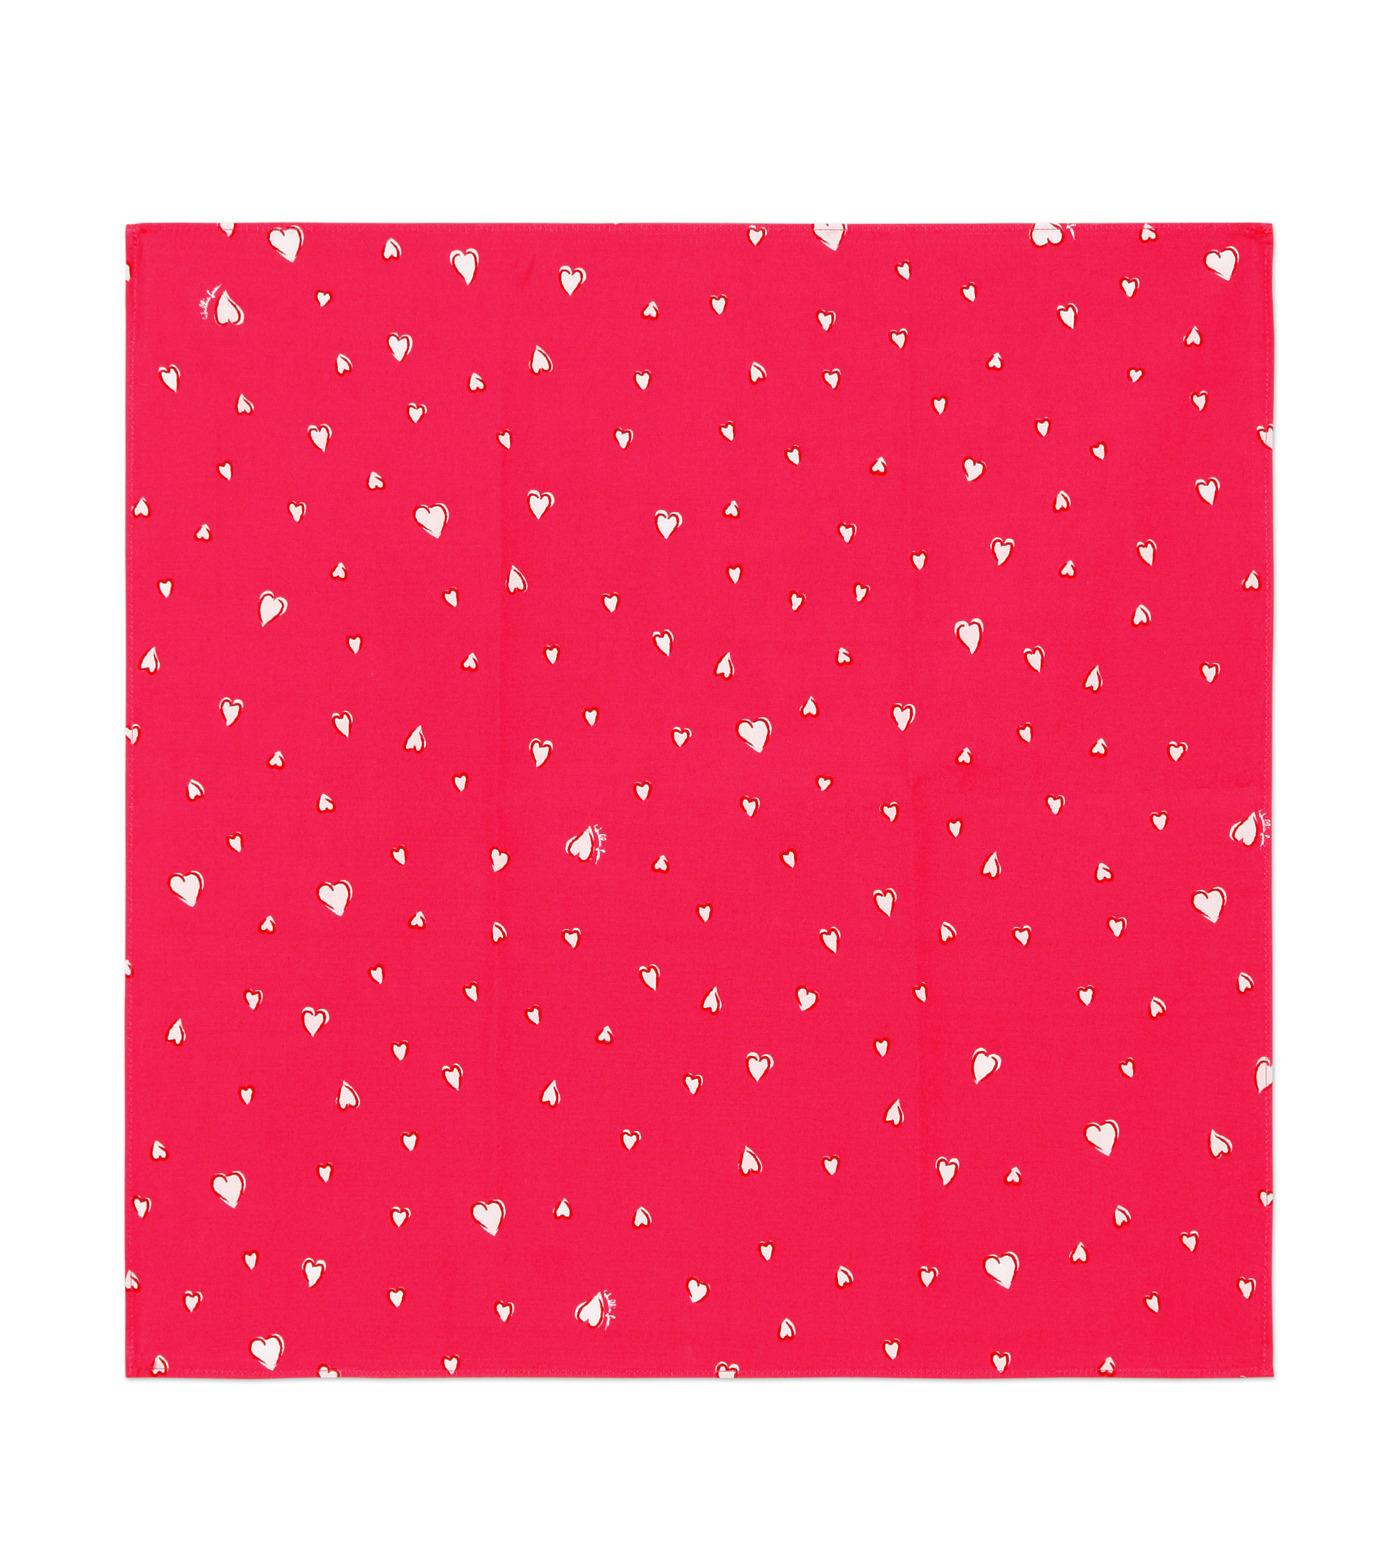 HL HEDDIE LOVU(エイチエル・エディールーヴ)のHEART PATTERN SHIRT-PINK(シャツ/shirt)-18S93001-72 拡大詳細画像7